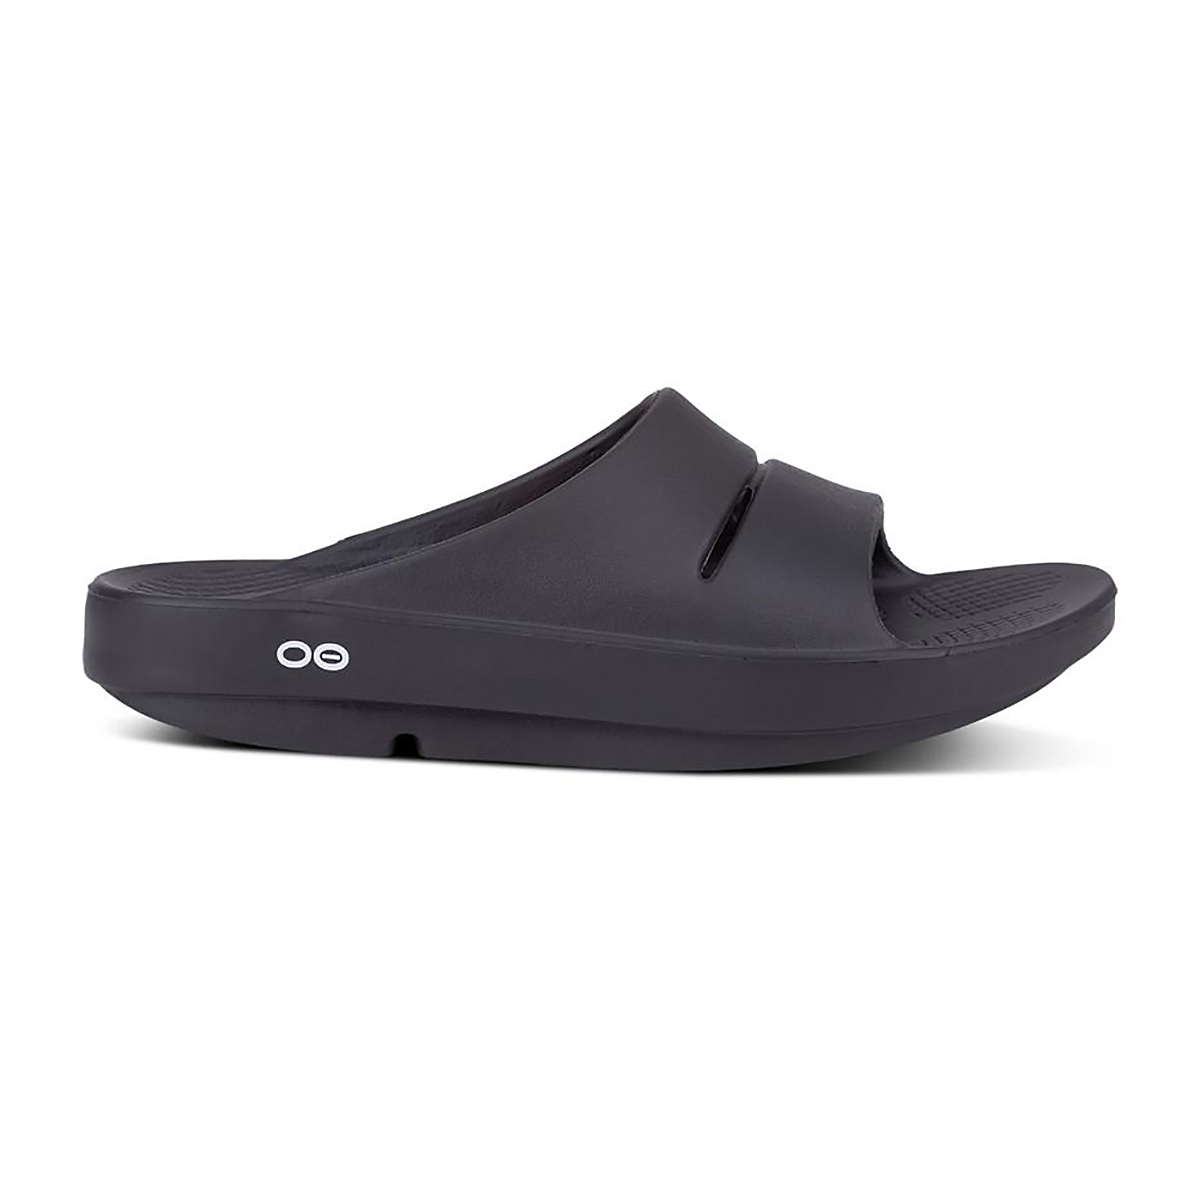 Oofos Ooahh Slide Recovery Sandal - Color: Black - Size: M7/W9 - Width: Regular, Black, large, image 1